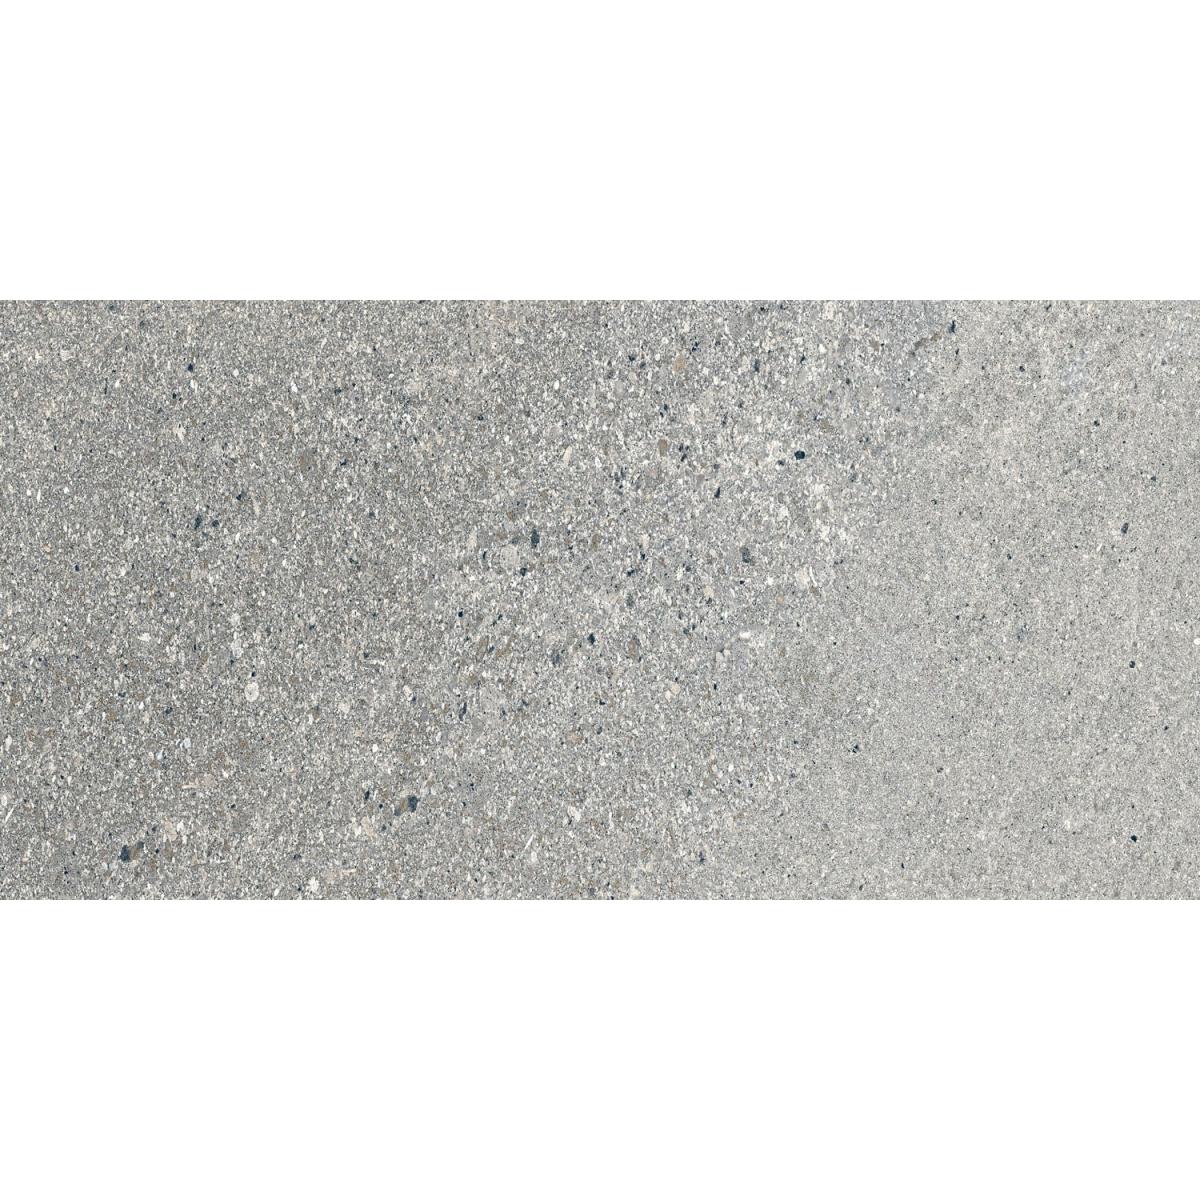 Base Stromboli Silver 37,5x75 Rectificada (caja 1,125 m2)